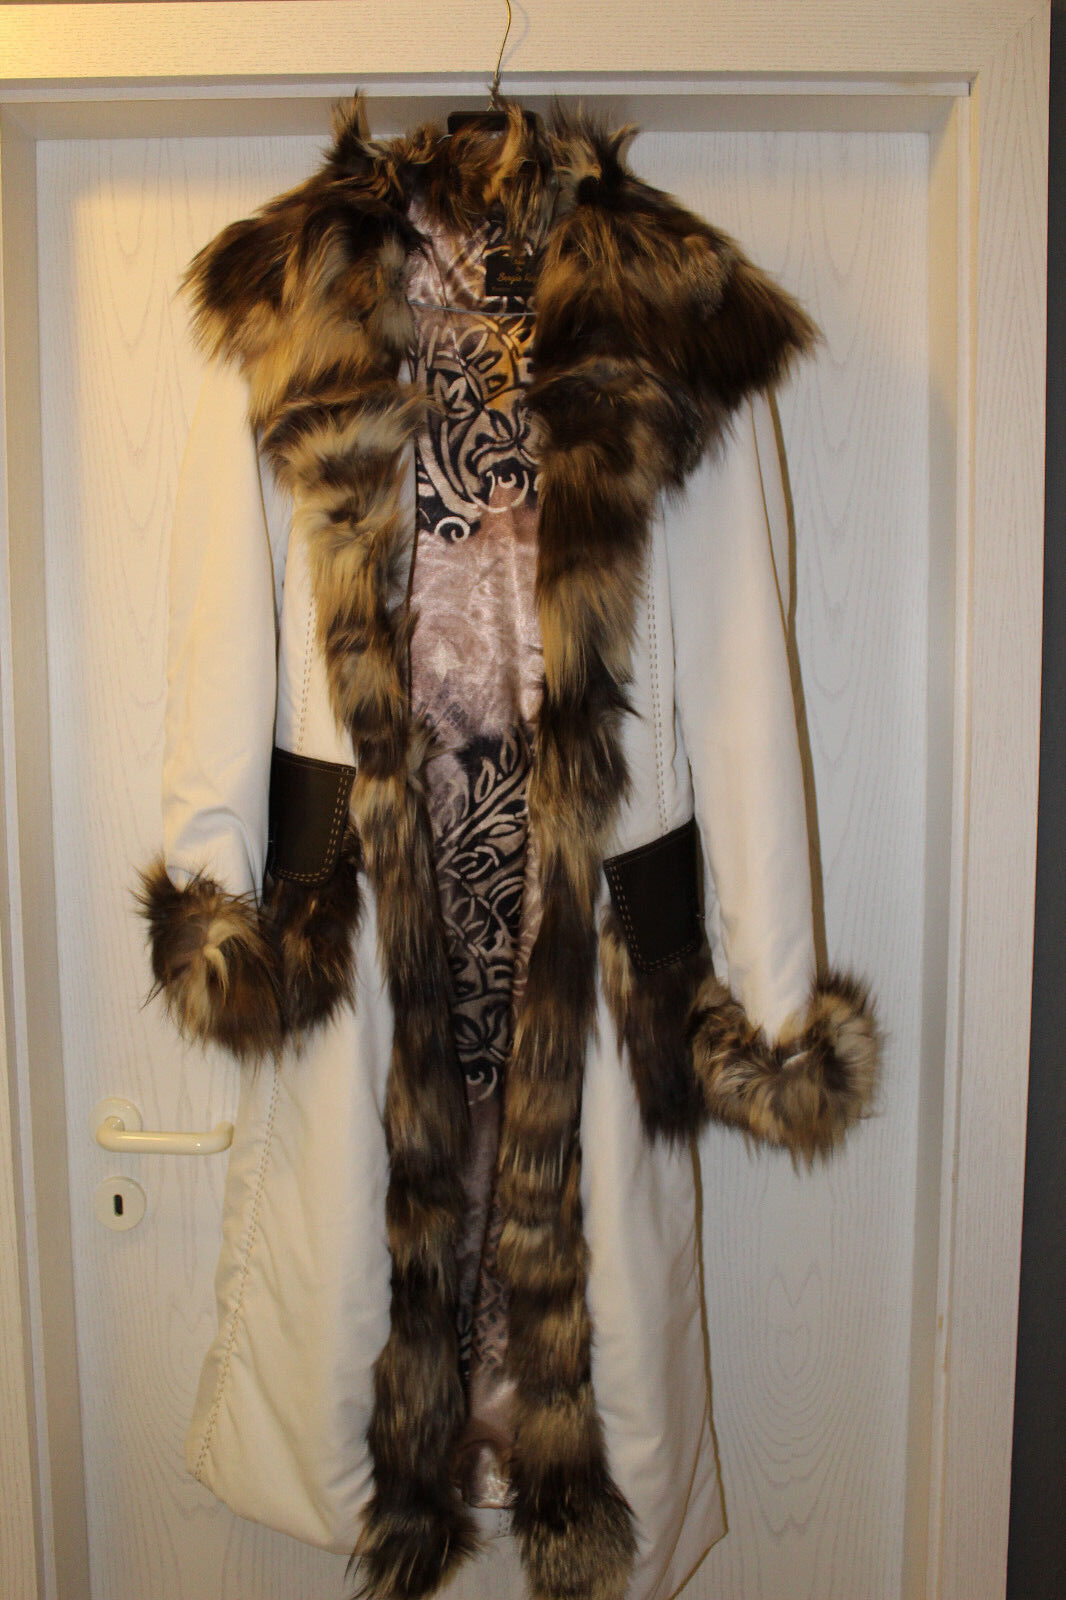 Pelzkragen Wintermantel Mit Mäntel B6bb4aotz24635 Luxus 7f6byg